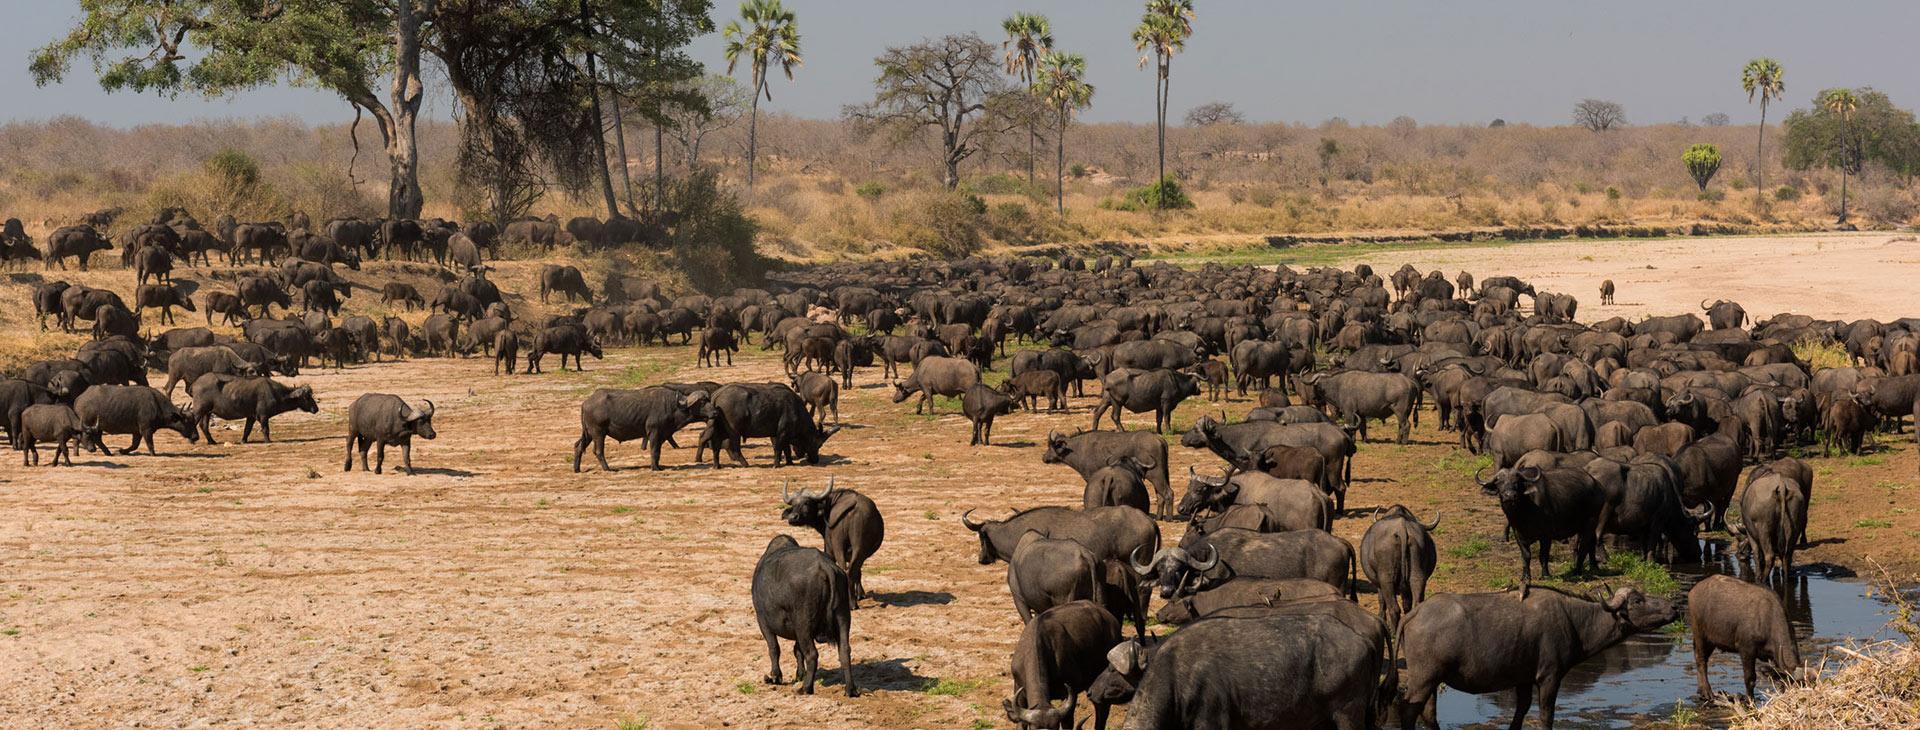 Tanzania Bush Camping Safari